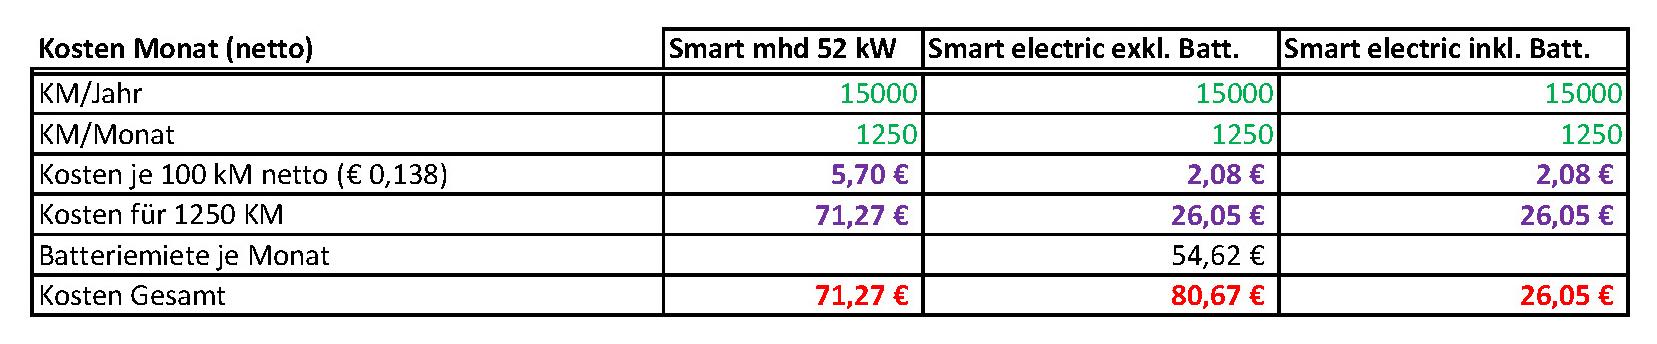 Smart_Electric_Drive_Kosten_Monat